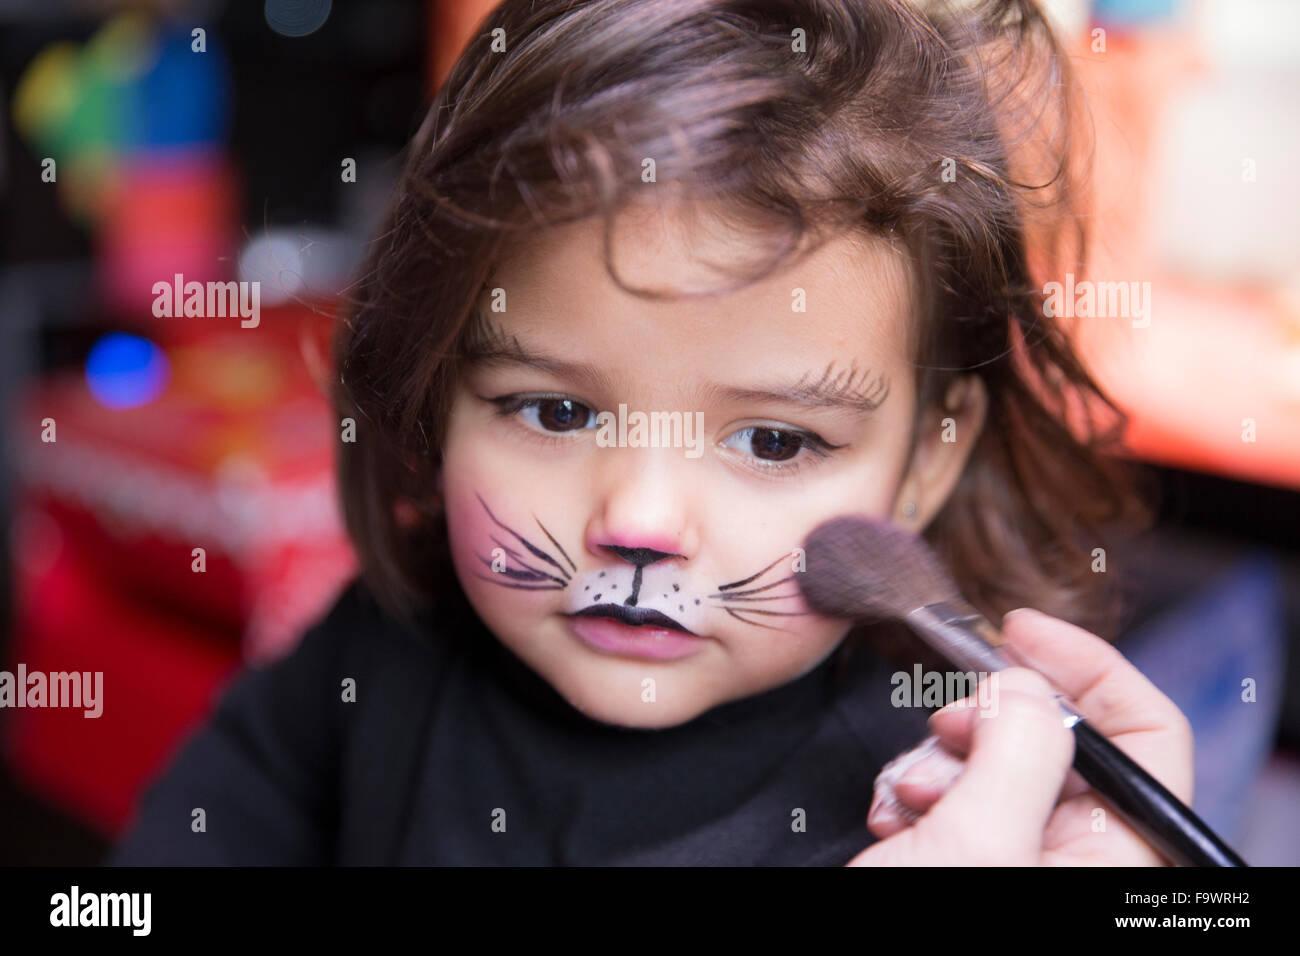 Uncategorized Cat Paint Face woman painting little girls face like a cat stock photo royalty cat